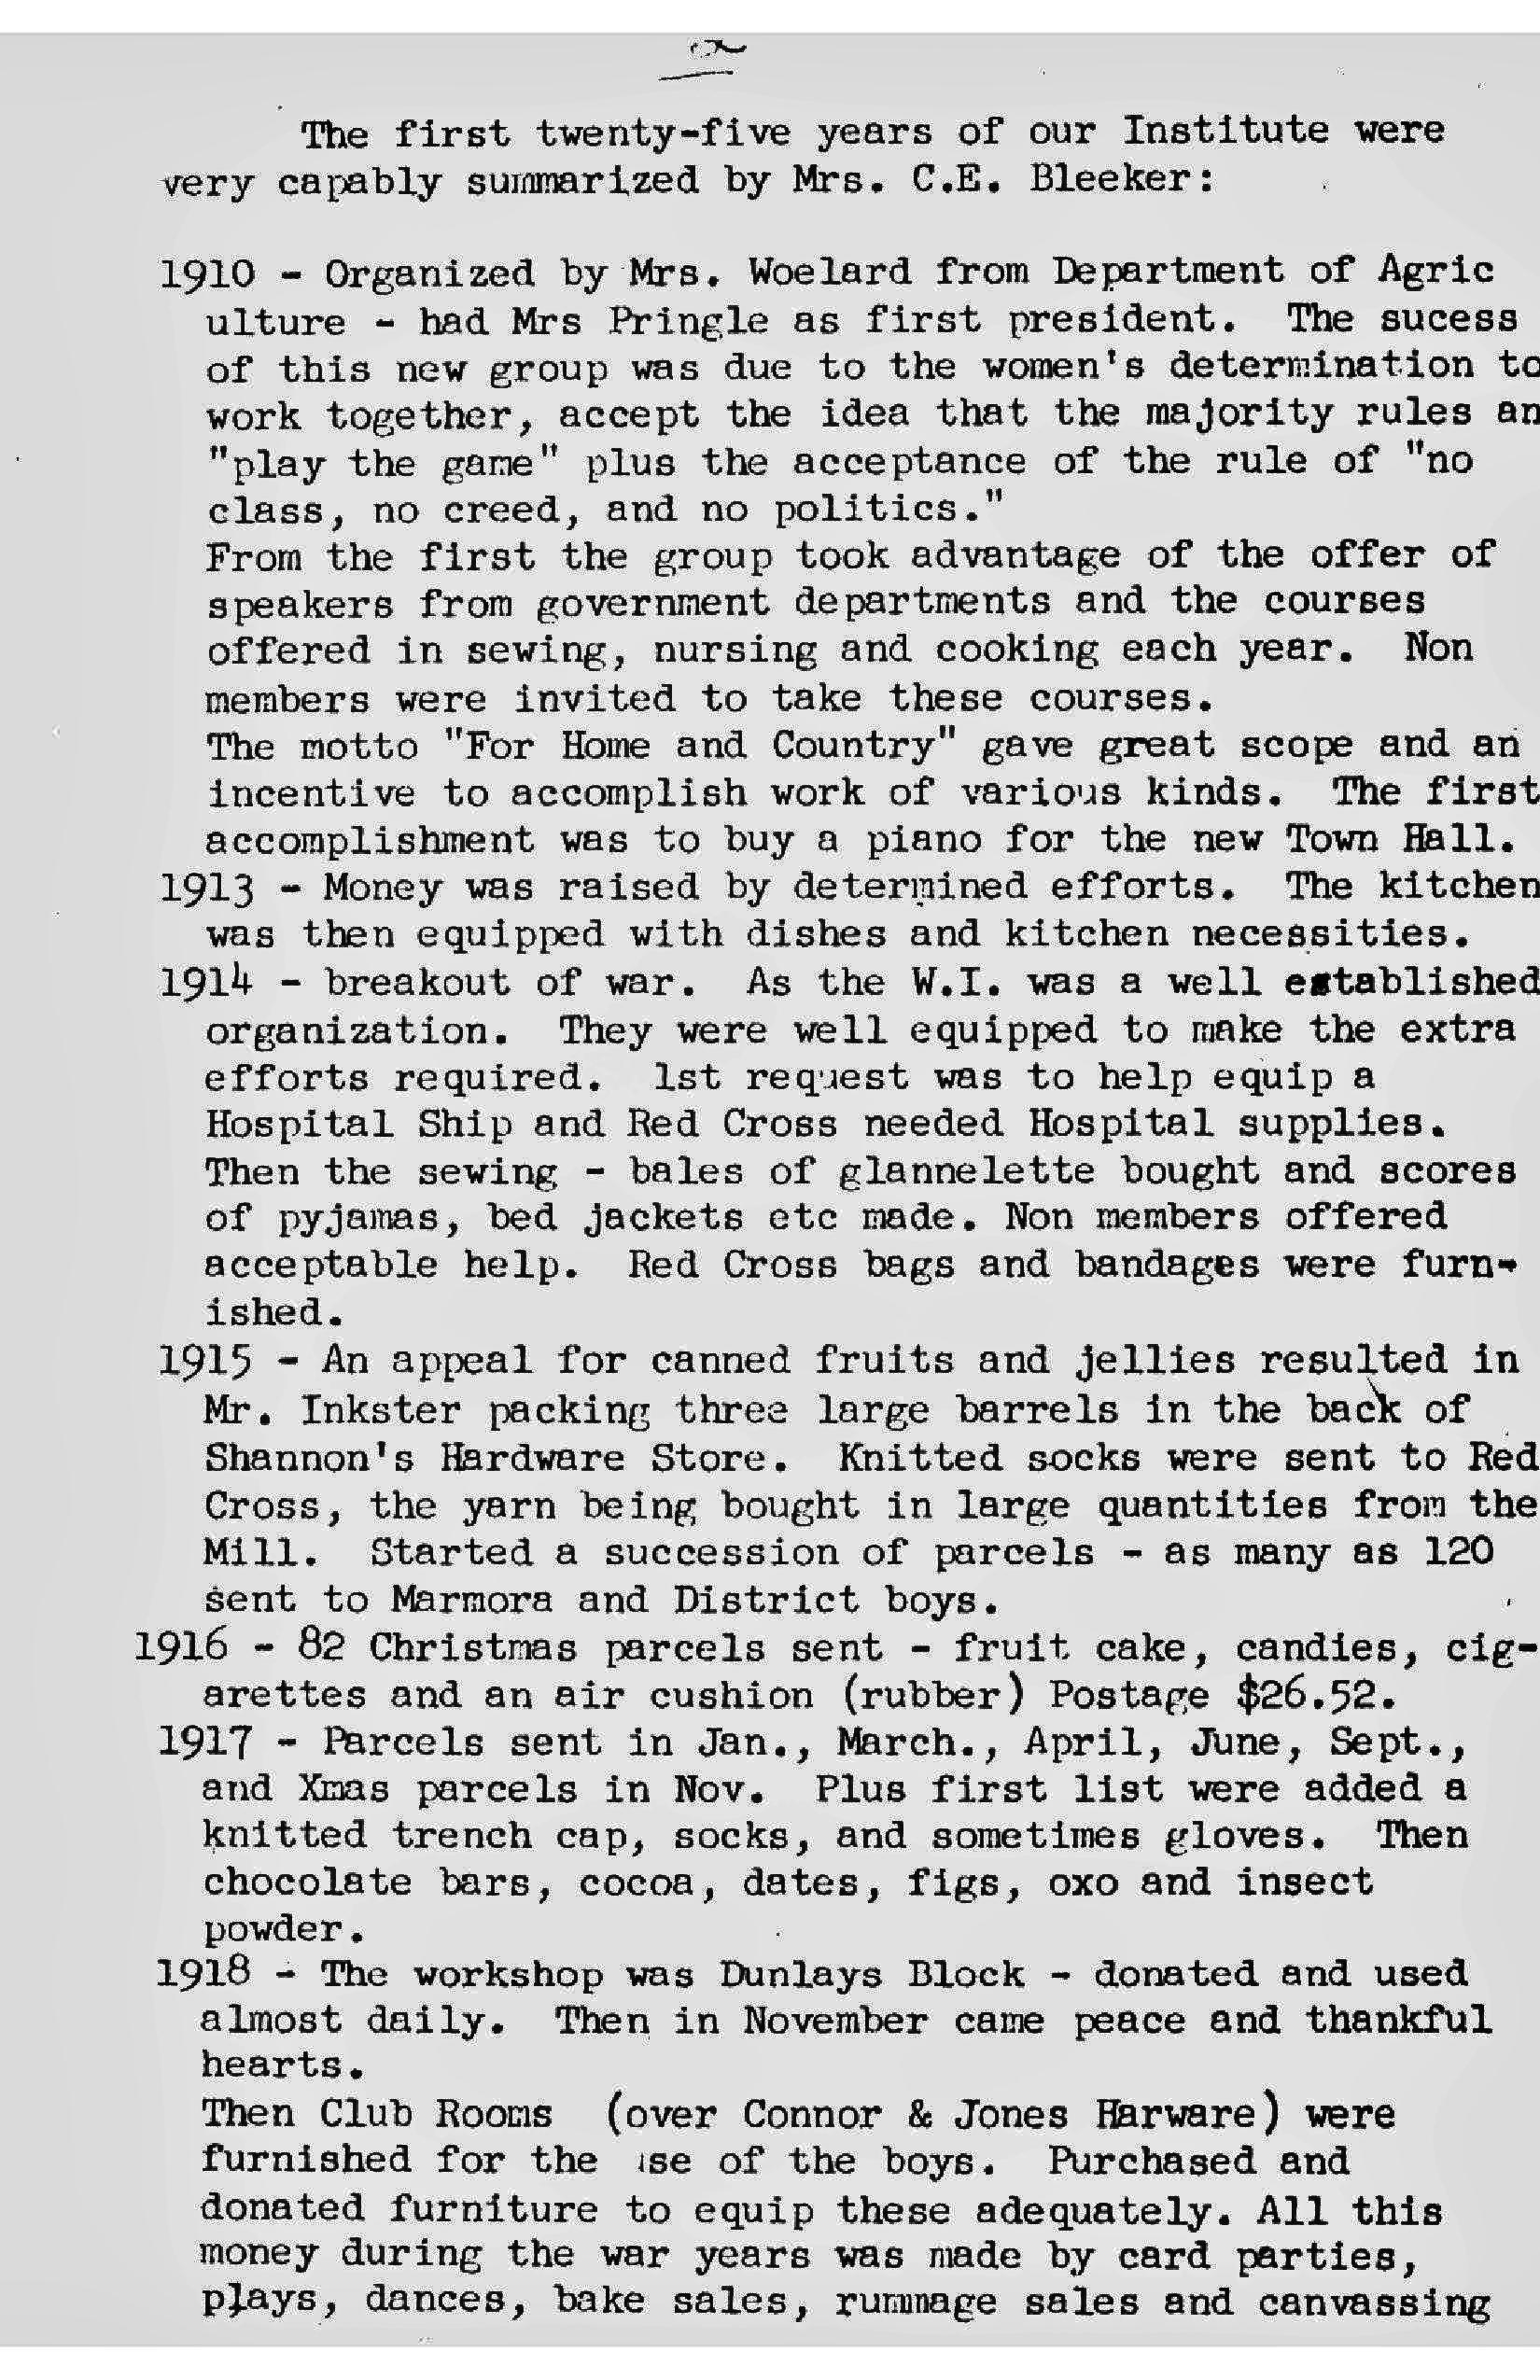 Women's Institute History of the past 86 years 002.jpg